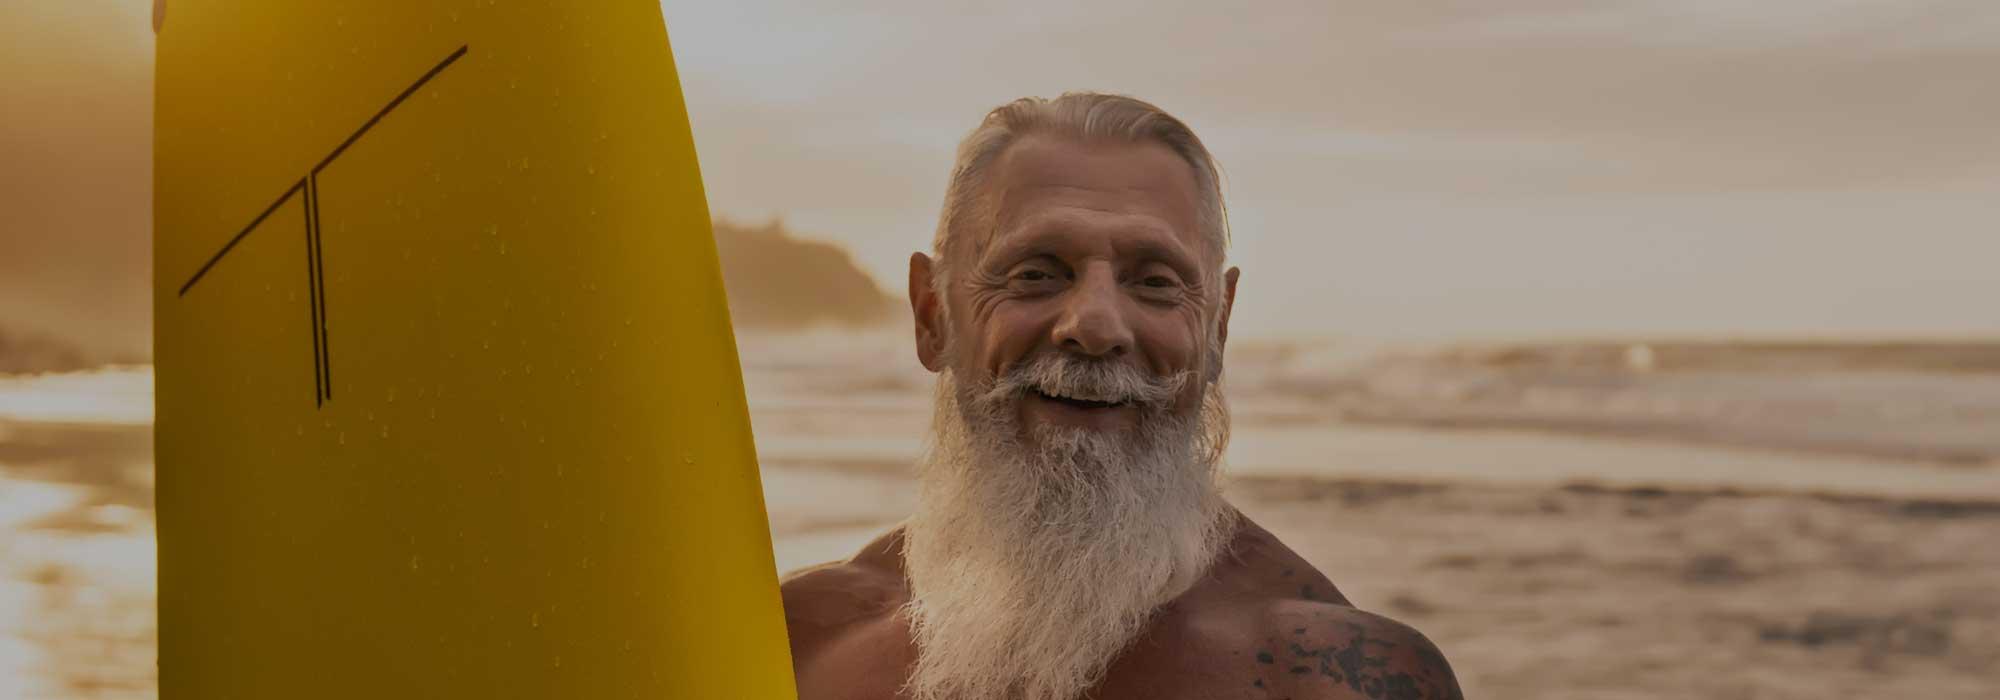 Senior bearded man at the sea holding yellow surfboard